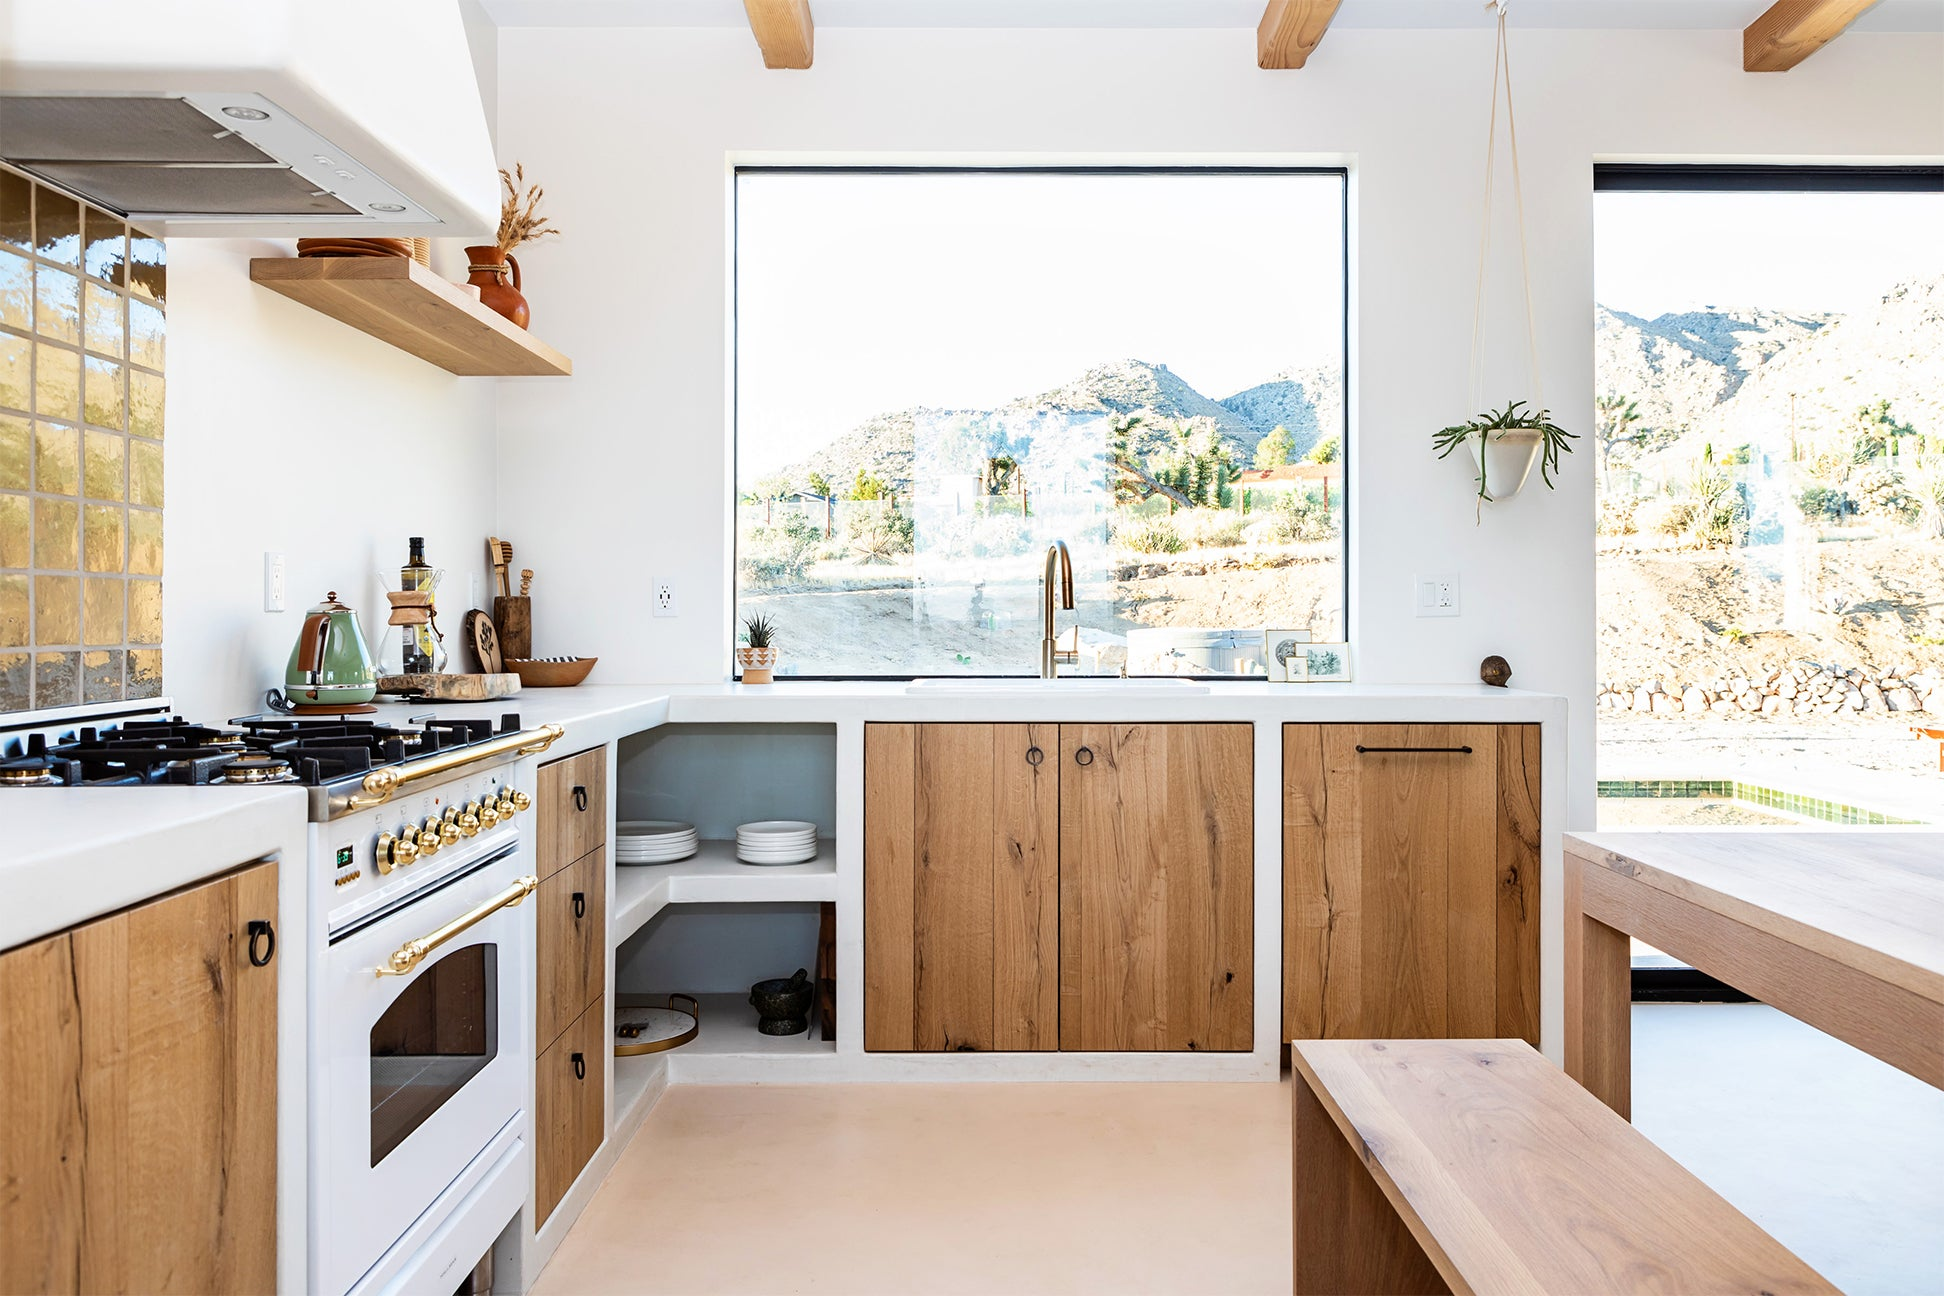 Southwestern style kitchen cabinets